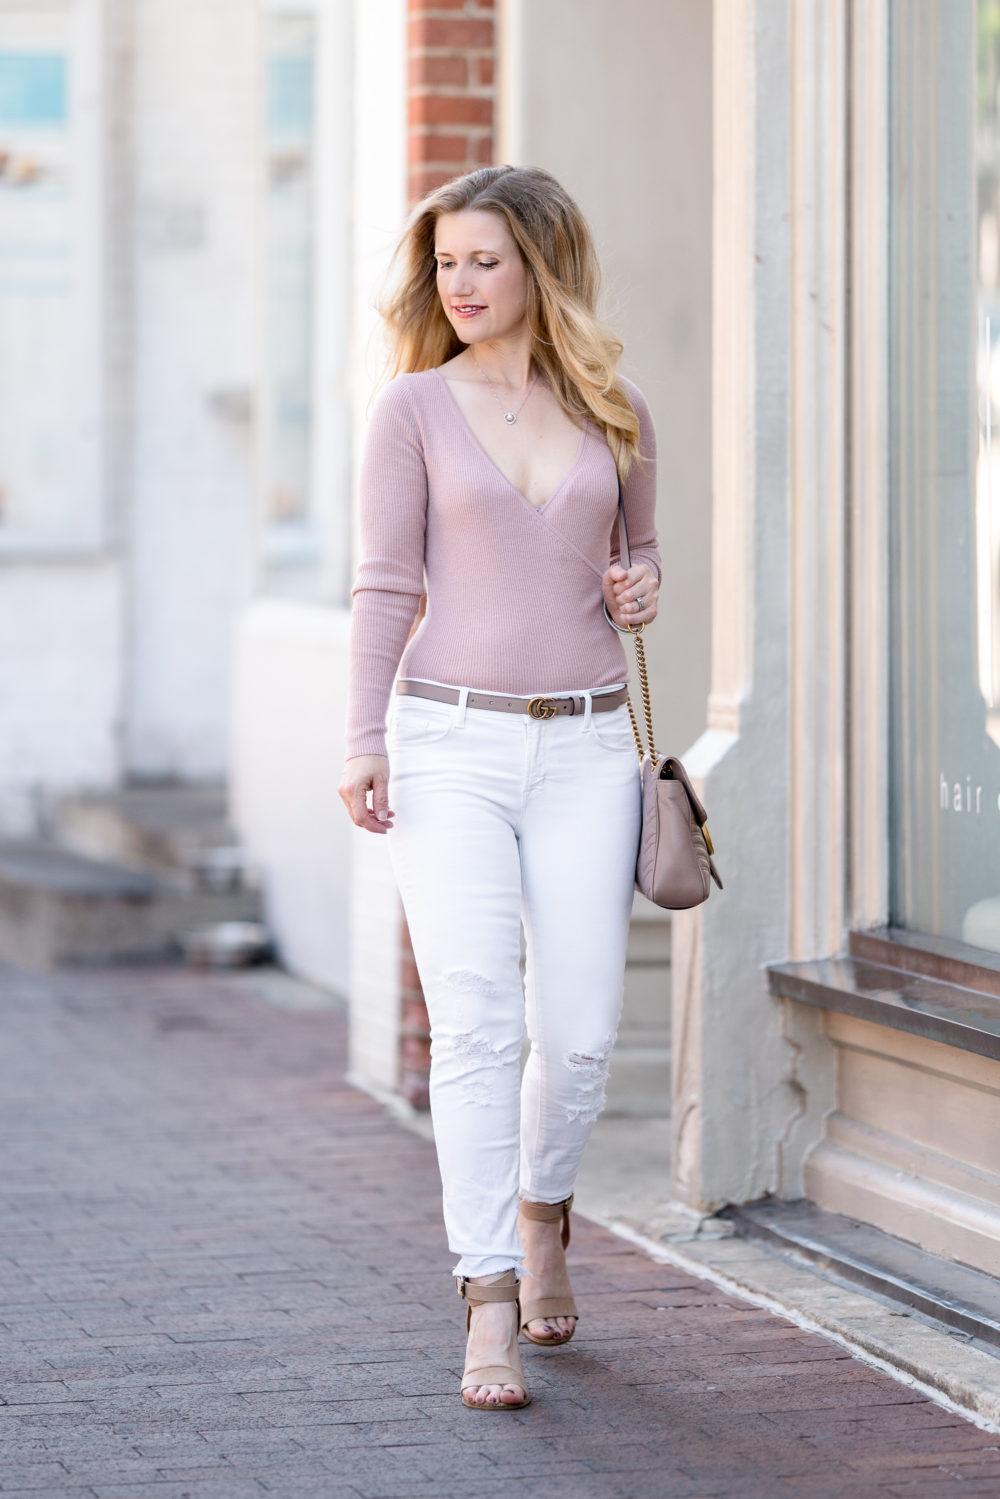 Petite Fashion Blog | Nordstrom Anniversary Sale | Leith Wrap Sweater | J Brand Crop Skinny Jeans | Gucci Belt | Gucci Marmont Shoulder Bag